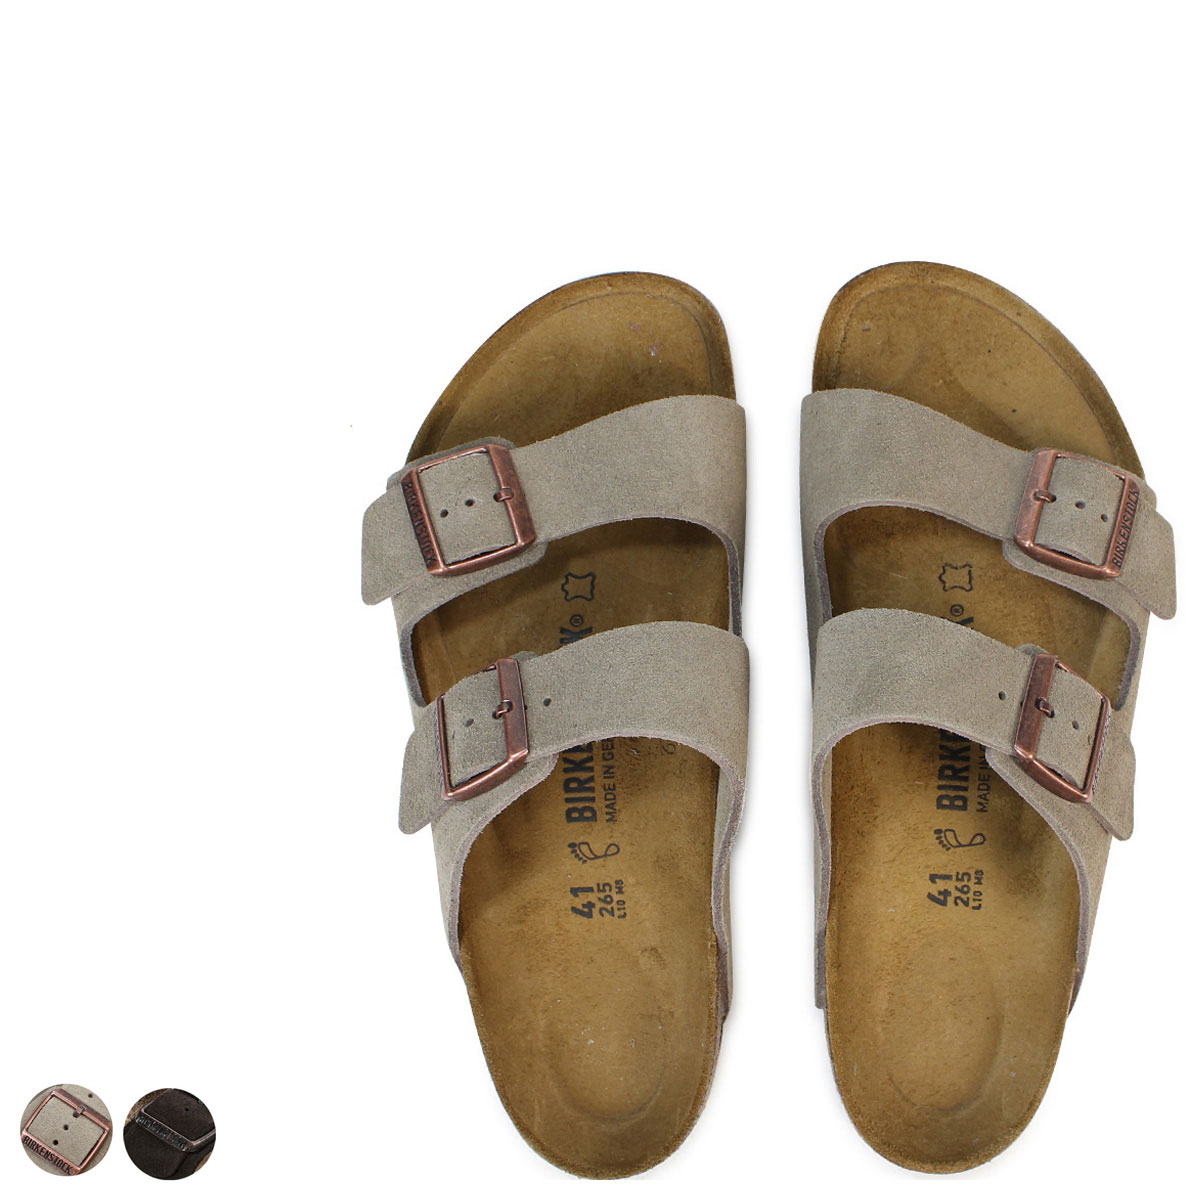 separation shoes 65dd8 4de49 Width suede [186] usually thin BIRKENSTOCK ARIZONA  アリゾナメンズレディースビルケンシュトックビルケンサンダル